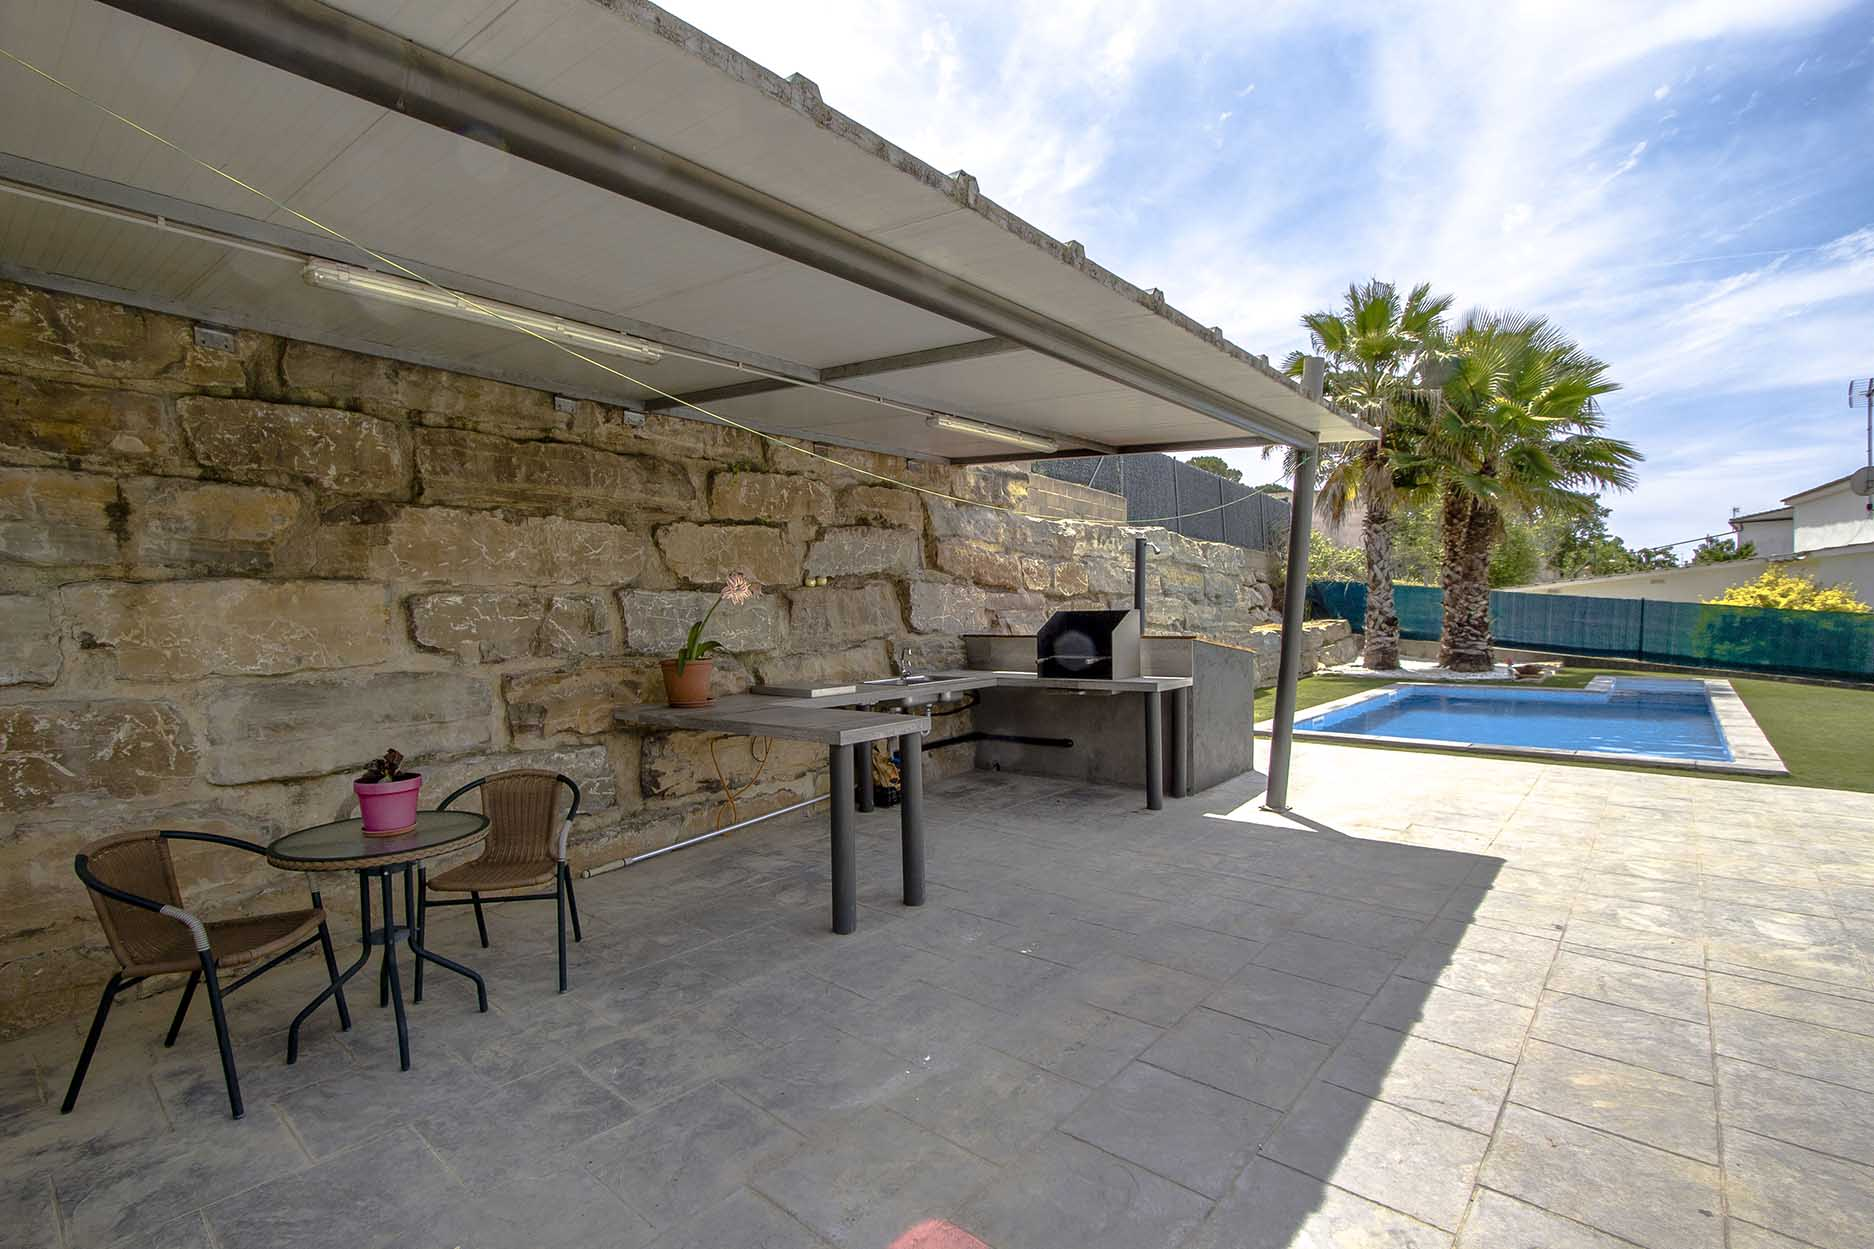 Ferienhaus Catalunya Casas: Modern villa in Sils, 15 min drive to Costa Brava beaches! (1902227), Les Mallorquines, Girona, Katalonien, Spanien, Bild 24